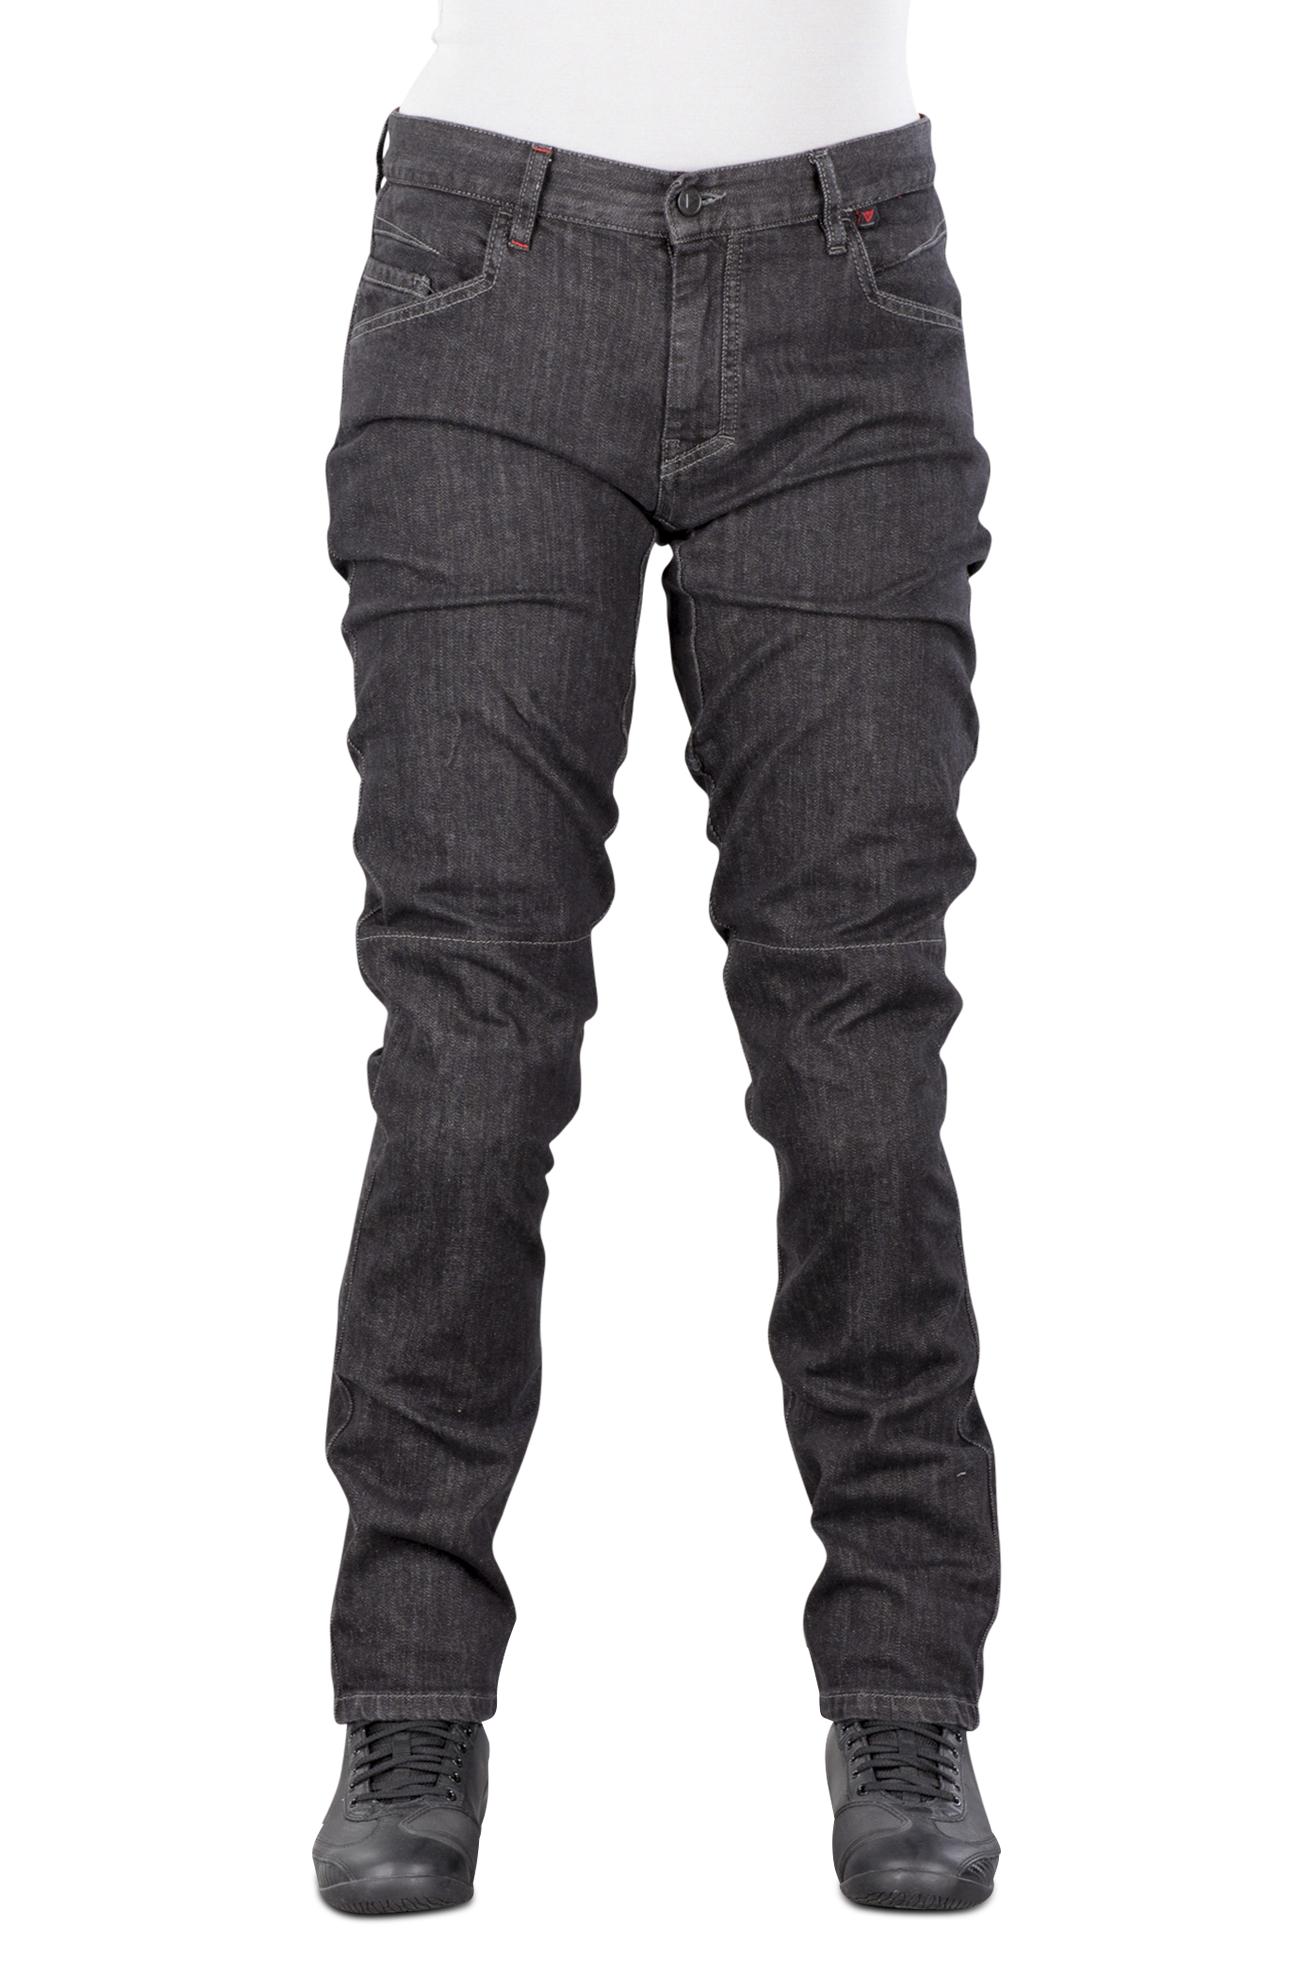 Dainese Jeans Moto Donna  Alba Slim-Fit Nero-Rinsed